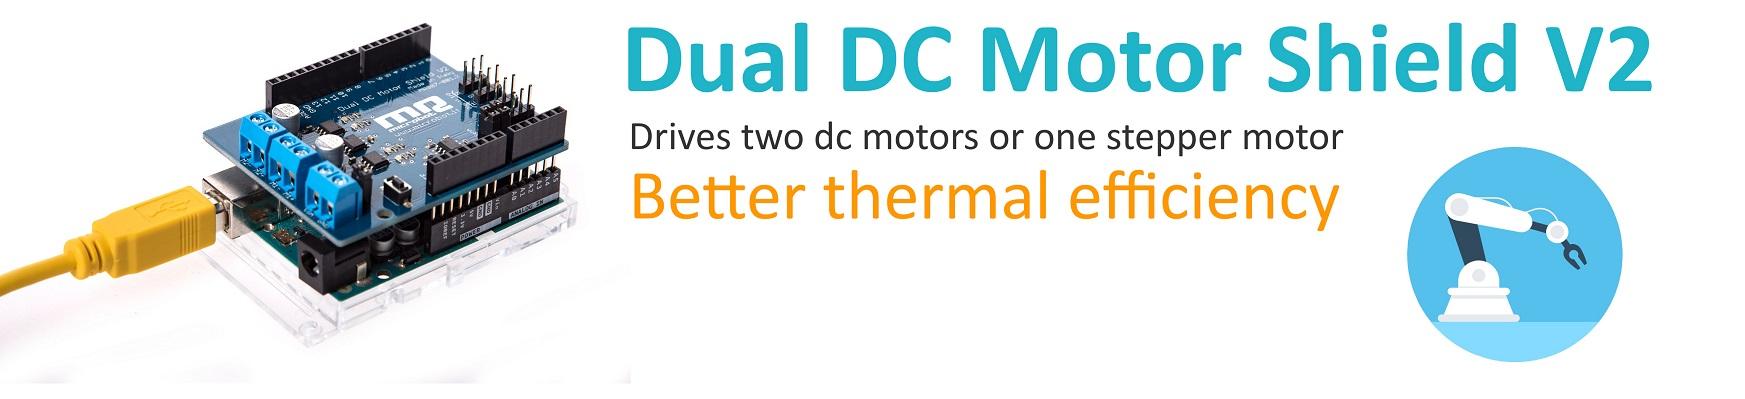 Dual DC Motor Shield V2